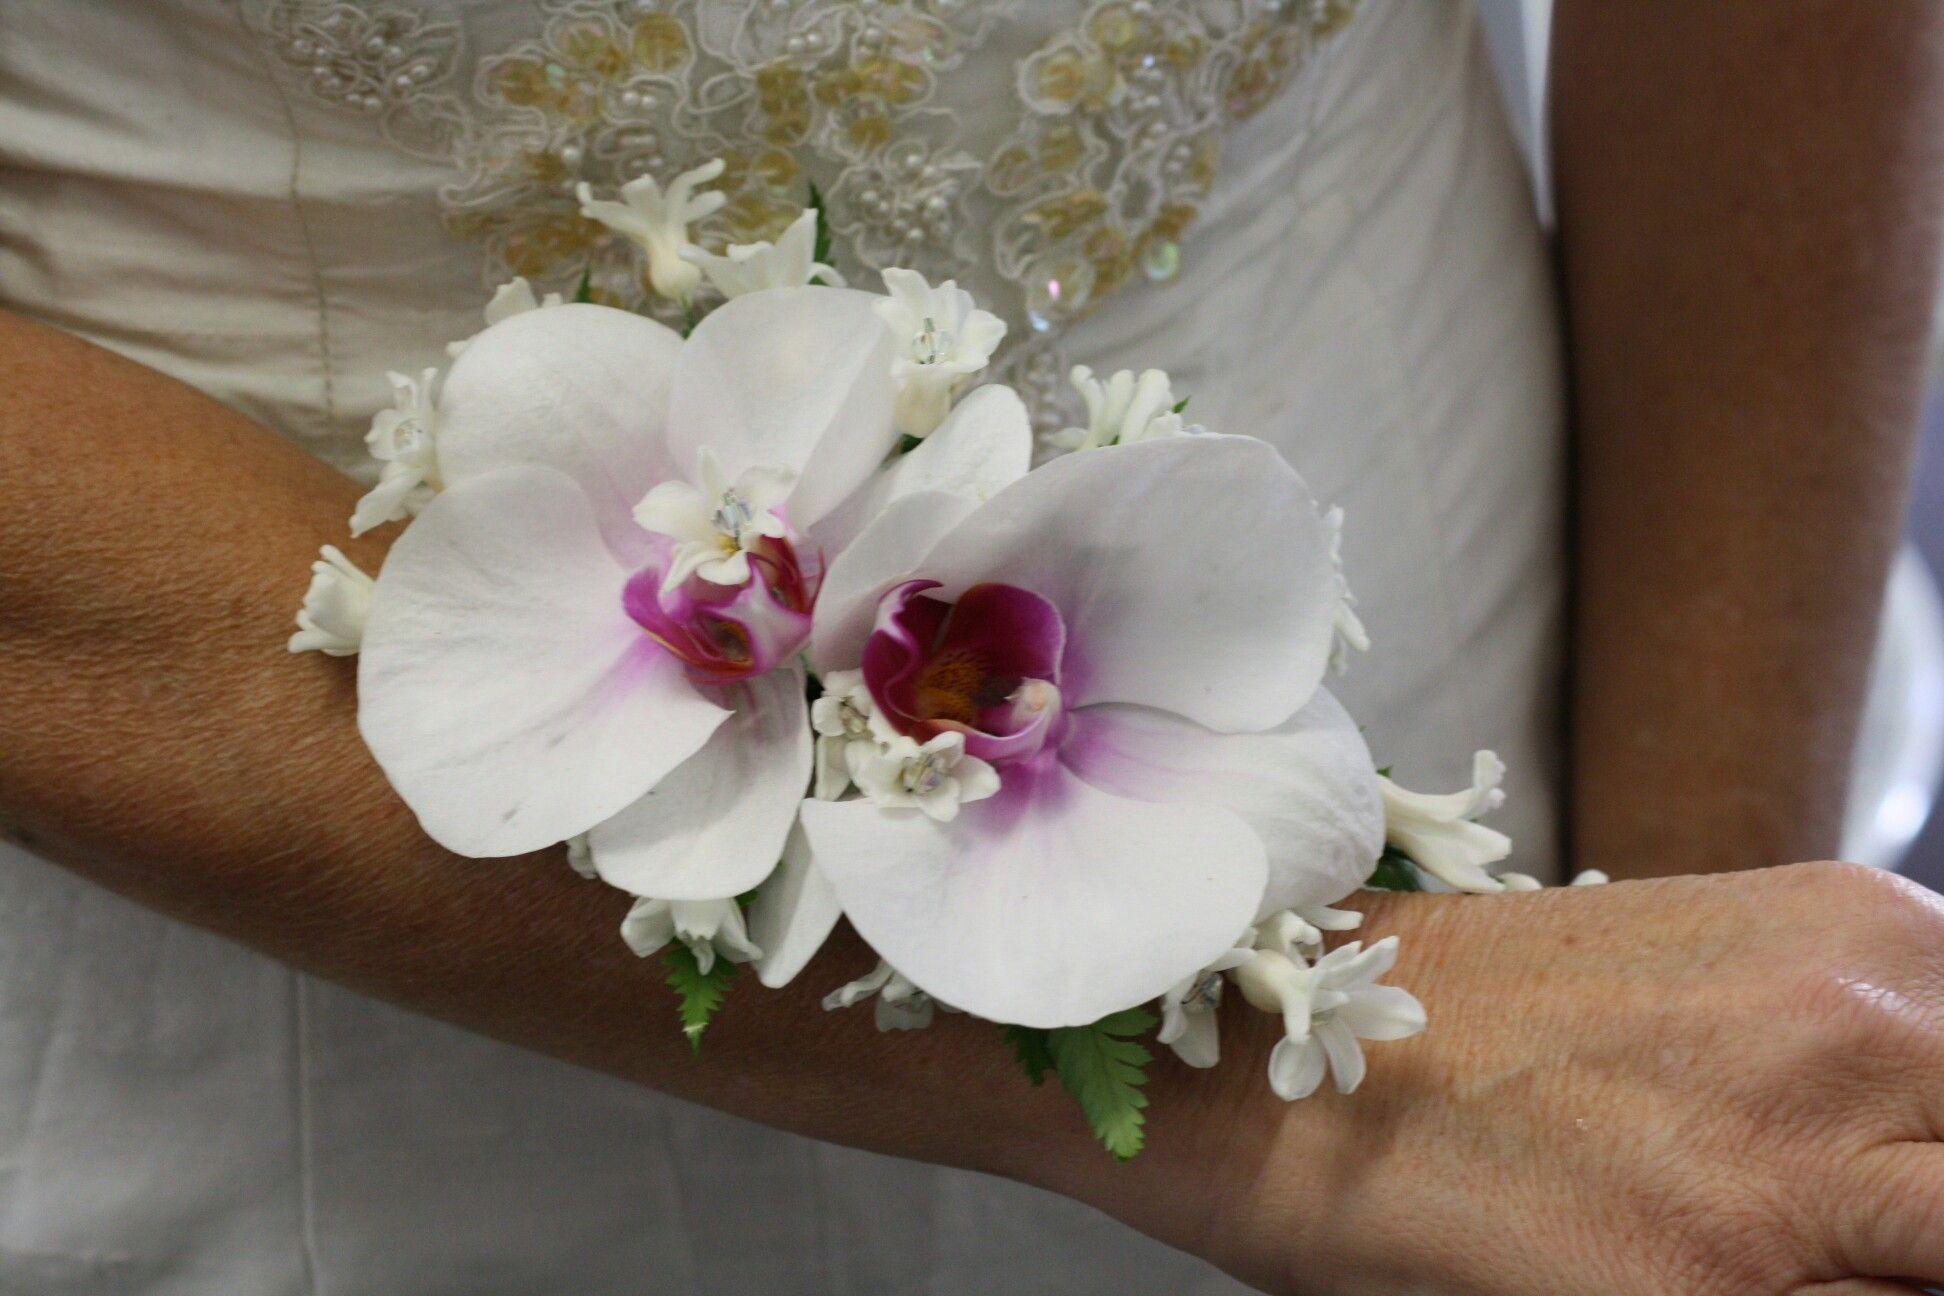 White/Fuchsia Phalaenopsis Orchids + White Hyacinth Wrist Corsage